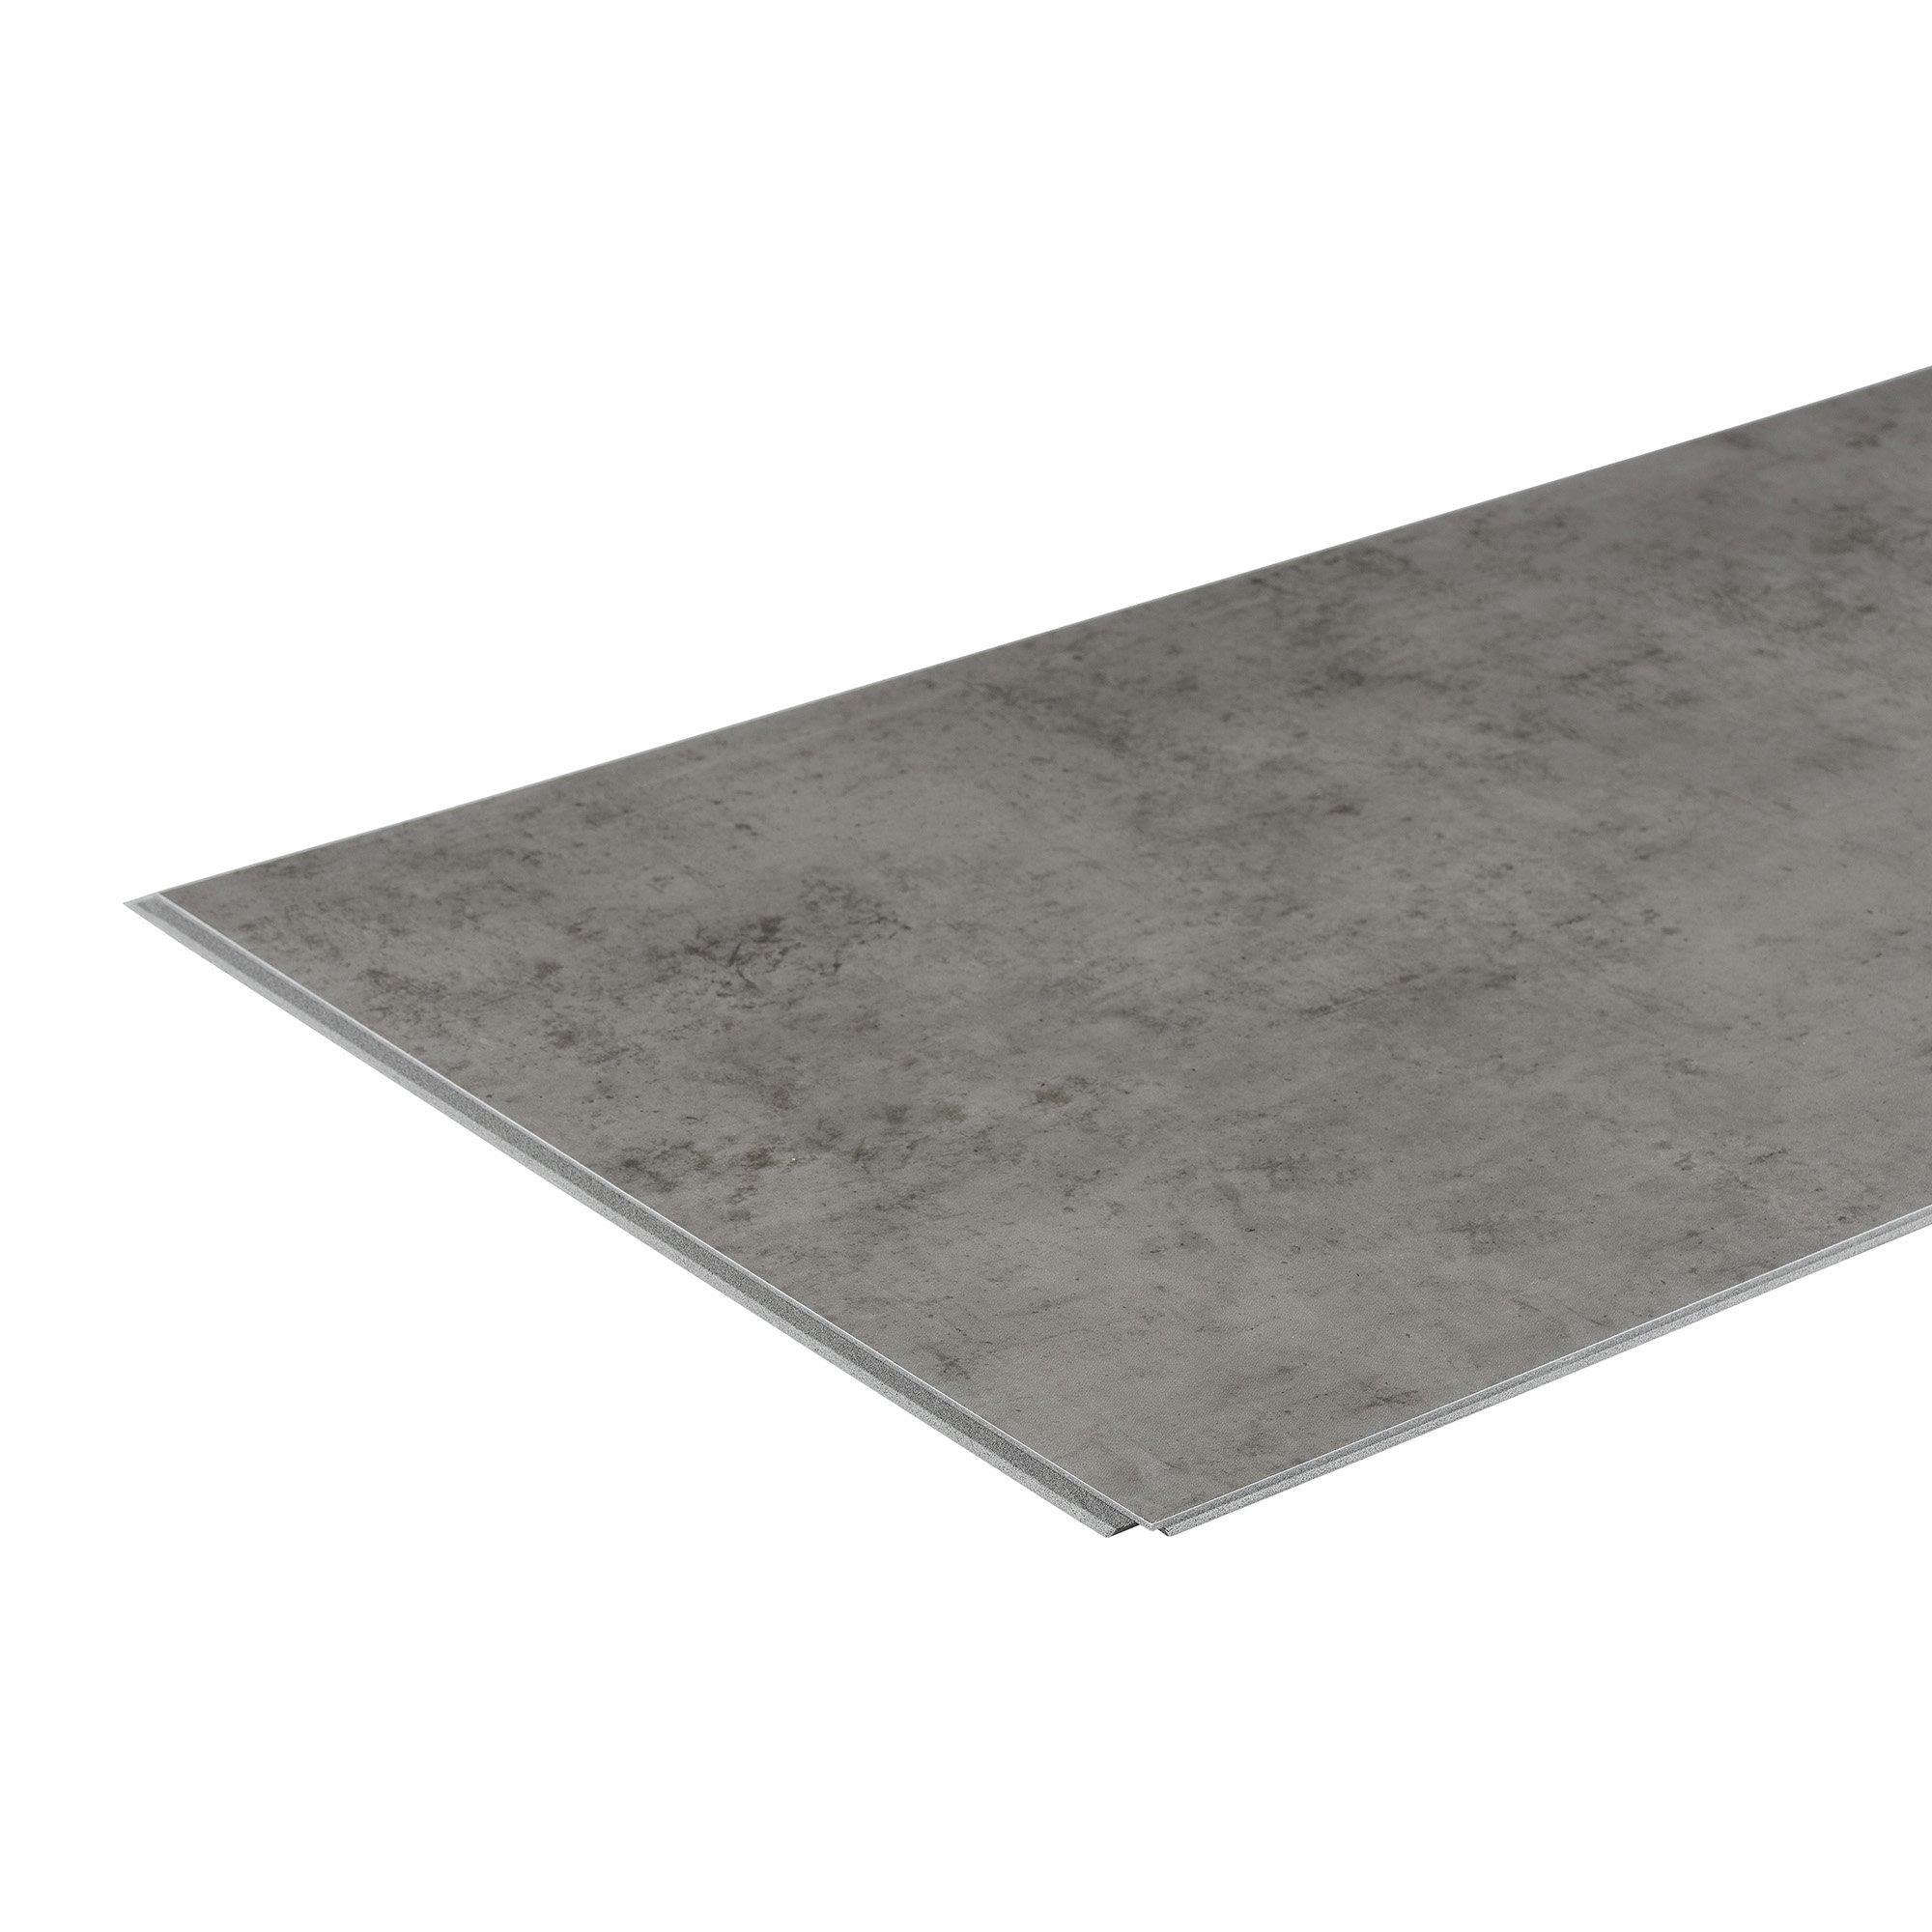 Interlocking Vinyl Wall Tile by DumaWall - Waterproof, Durable Backsplash Panels for Kitchen, Bathroom, or Shower (Steel Wool)(Sample)